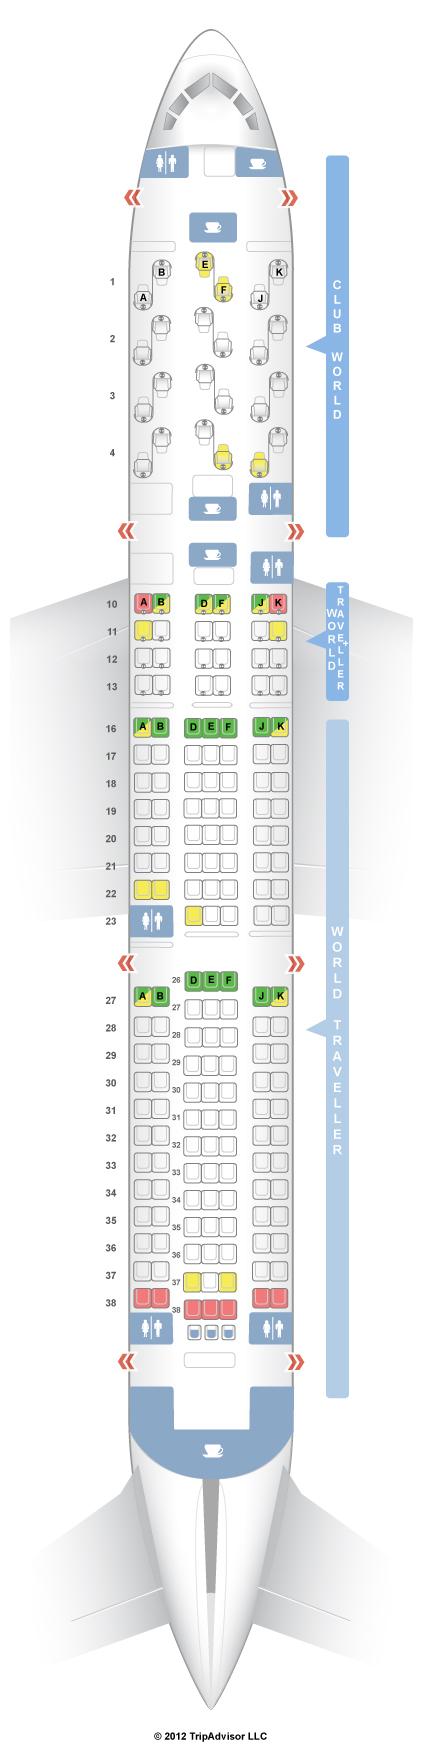 Seat Map Delta Airlines Boeing B767 400ER (76D) | SeatMaestro.com